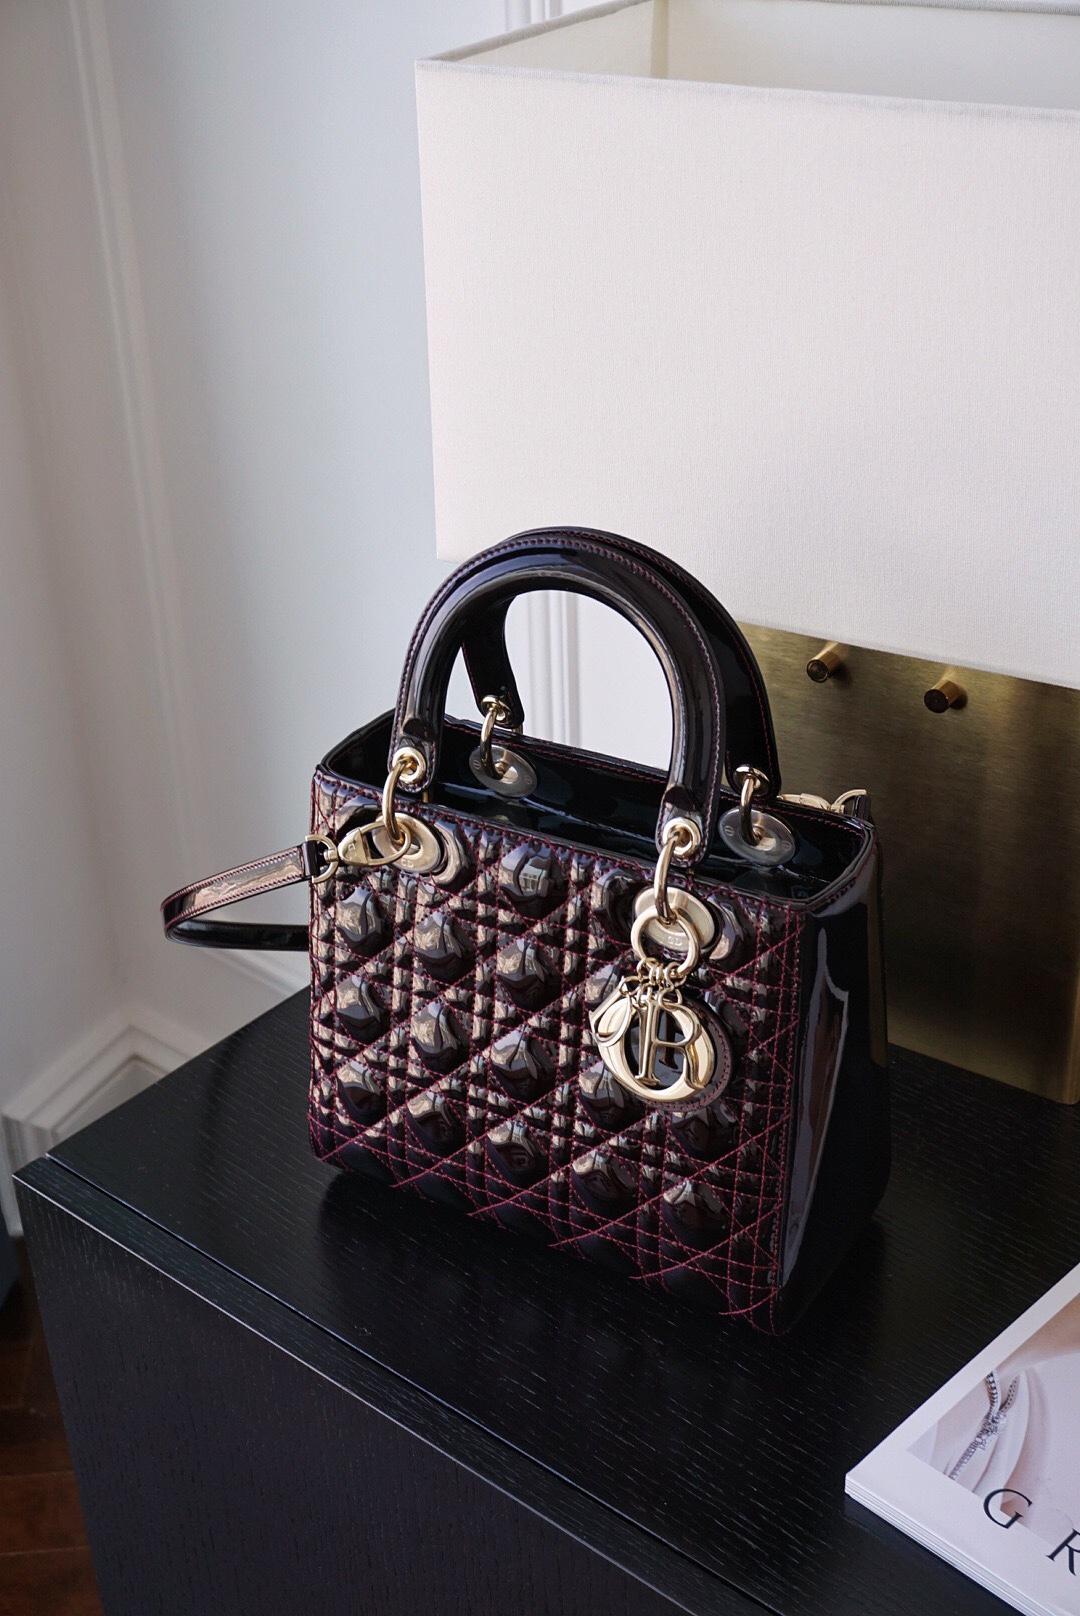 Dior 迪奥 戴妃包 五格/24cm 车厘子 漆皮,脱俗,高贵